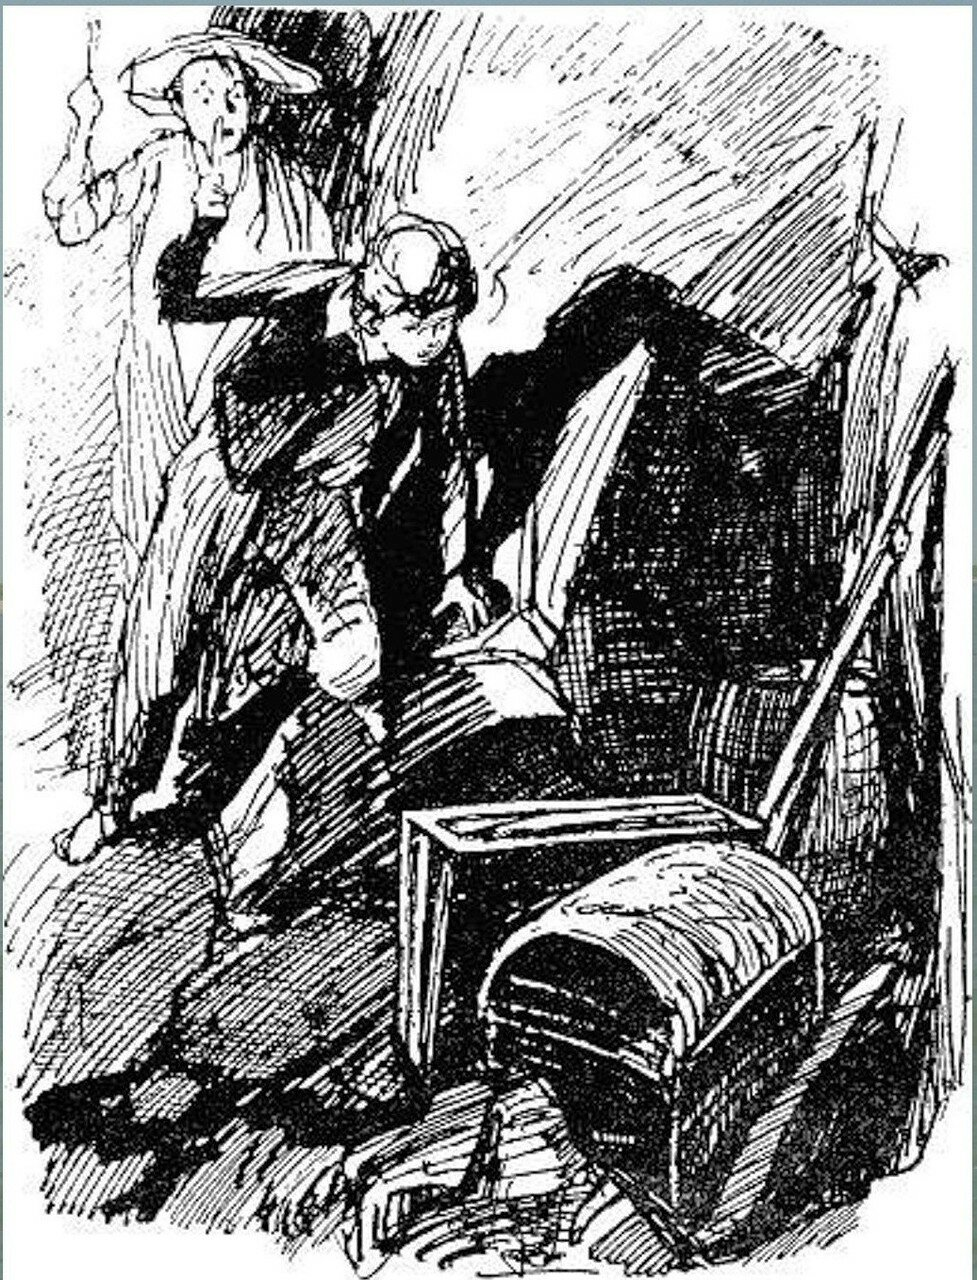 Иллюстрация В. Н. Горяева к пр-ю М.Твена Приключения Тома Сойера (43).jpg